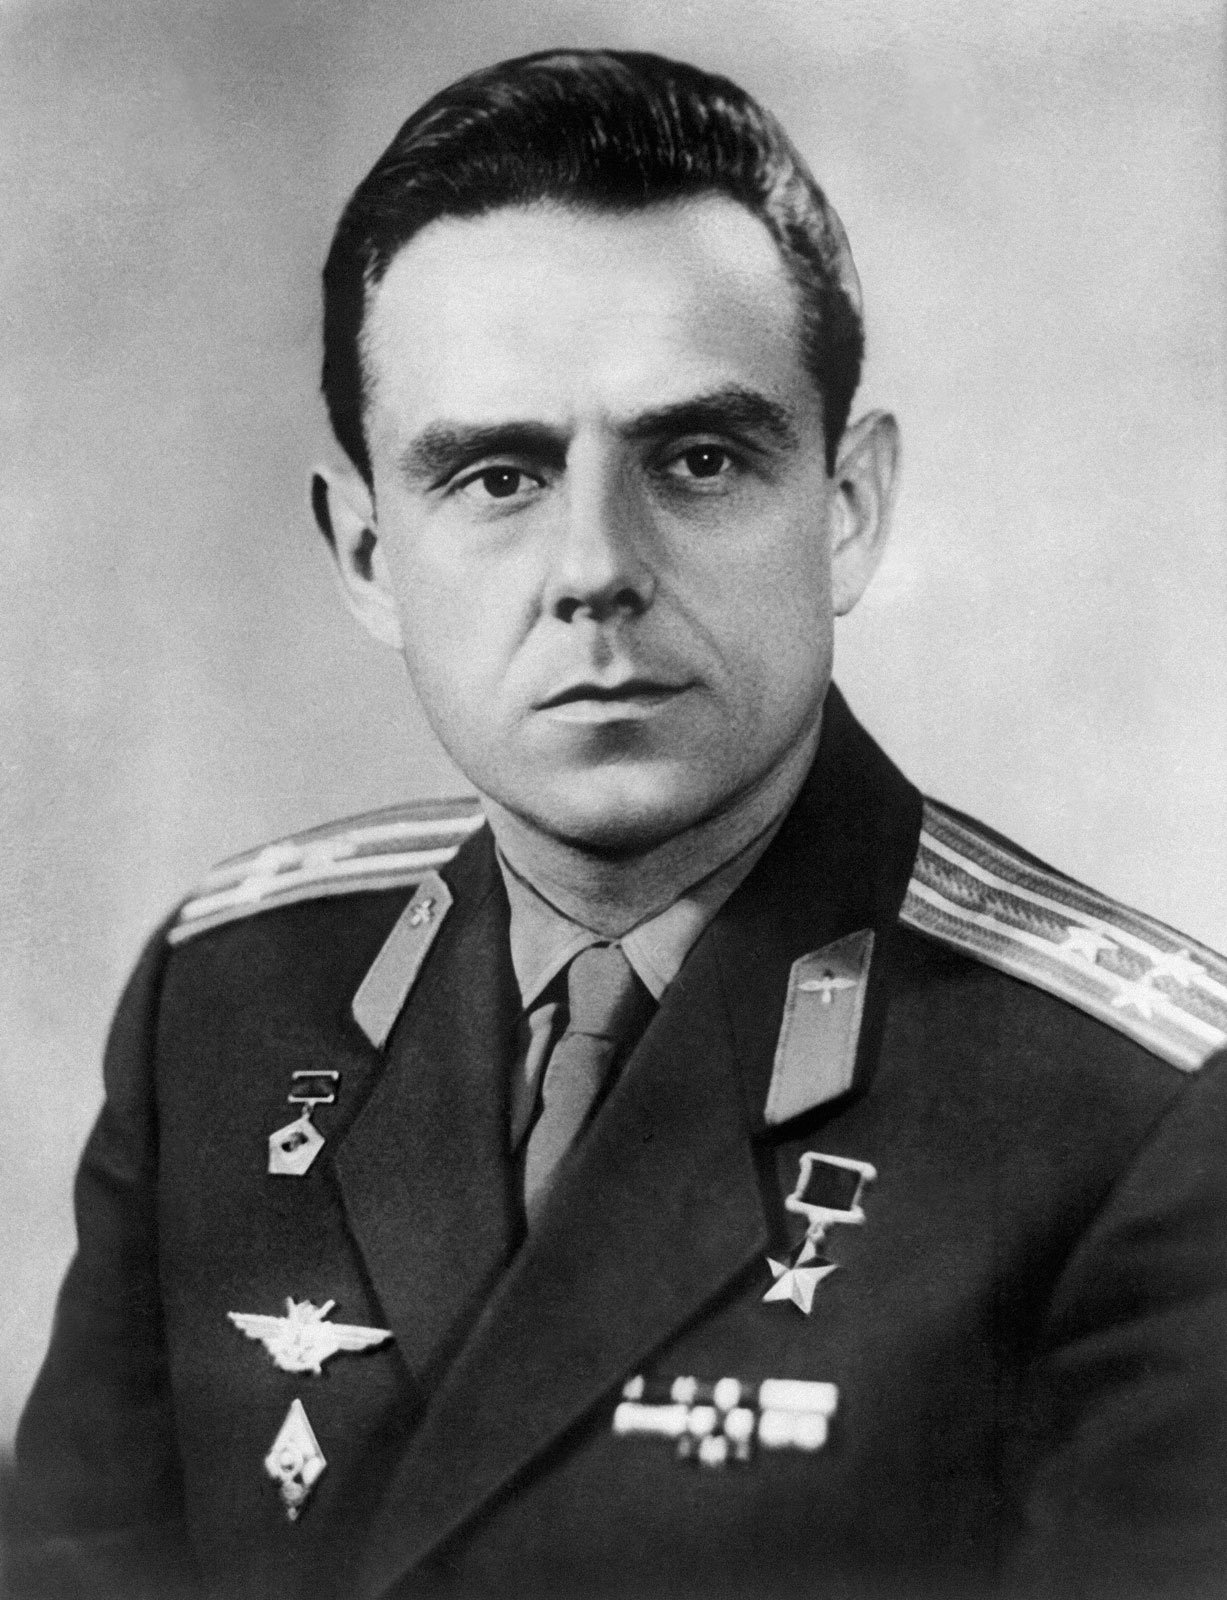 http://topwar.ru/uploads/posts/2012-05/1336220849_Vladimir-Komarov-theginpalace.com-2.jpg